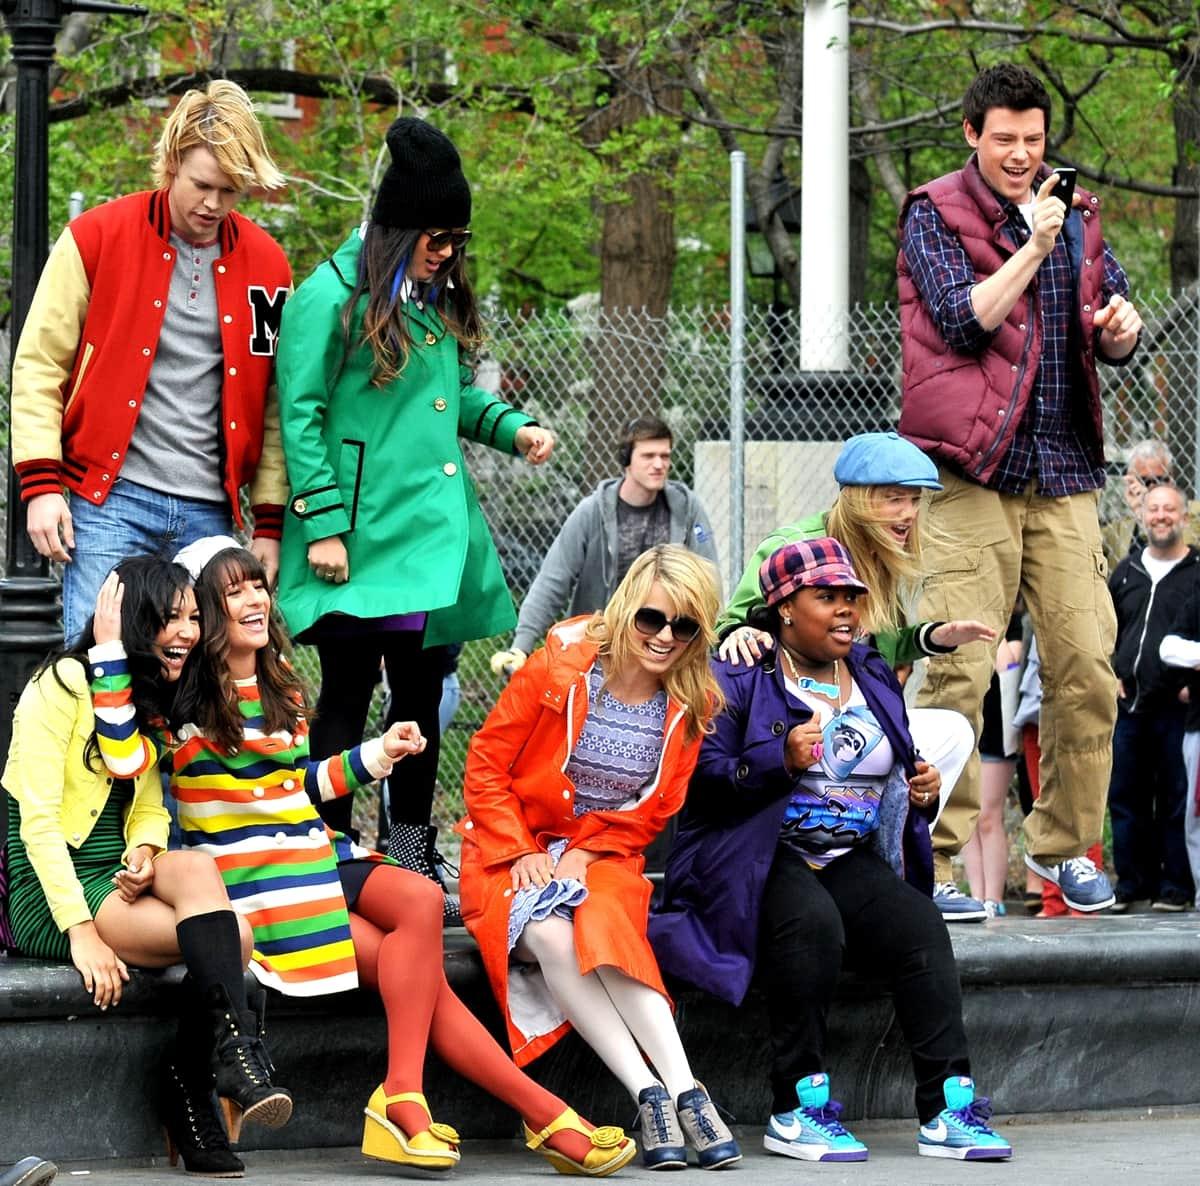 Chord Overstreet, Jenna Ushkowitz, Cory Monteith, Naya Rivera, Lea Michele, Dianna Agron, Heather Morris, and Amber Riley on location for 'Glee'